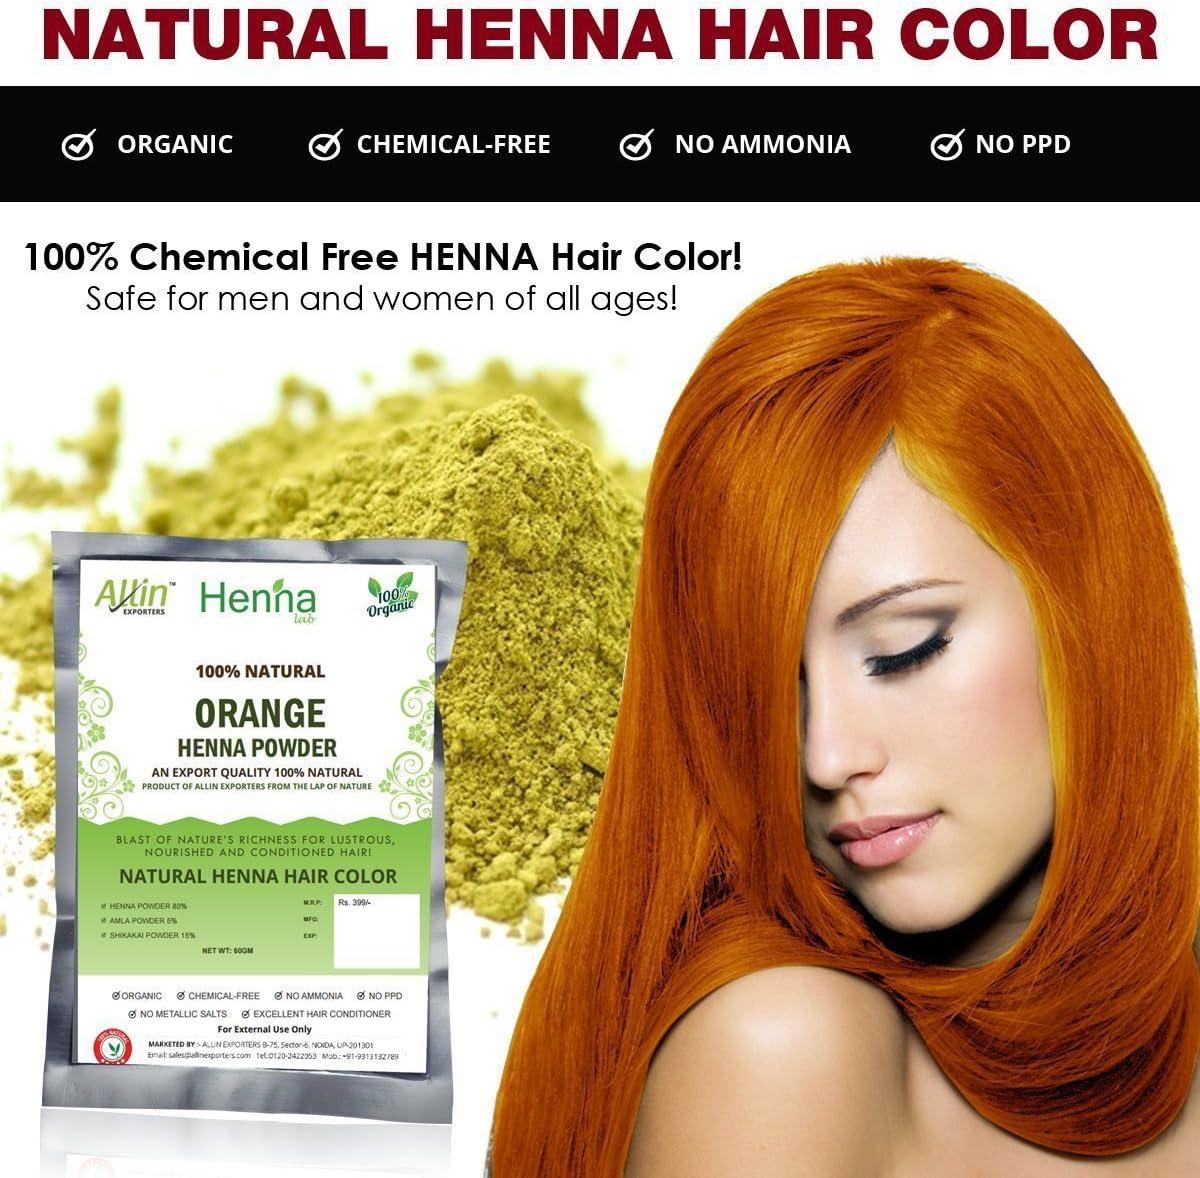 Henna Color de pelo polvo – 100% orgánico, libre de amoníaco, PPD, metálico Sales